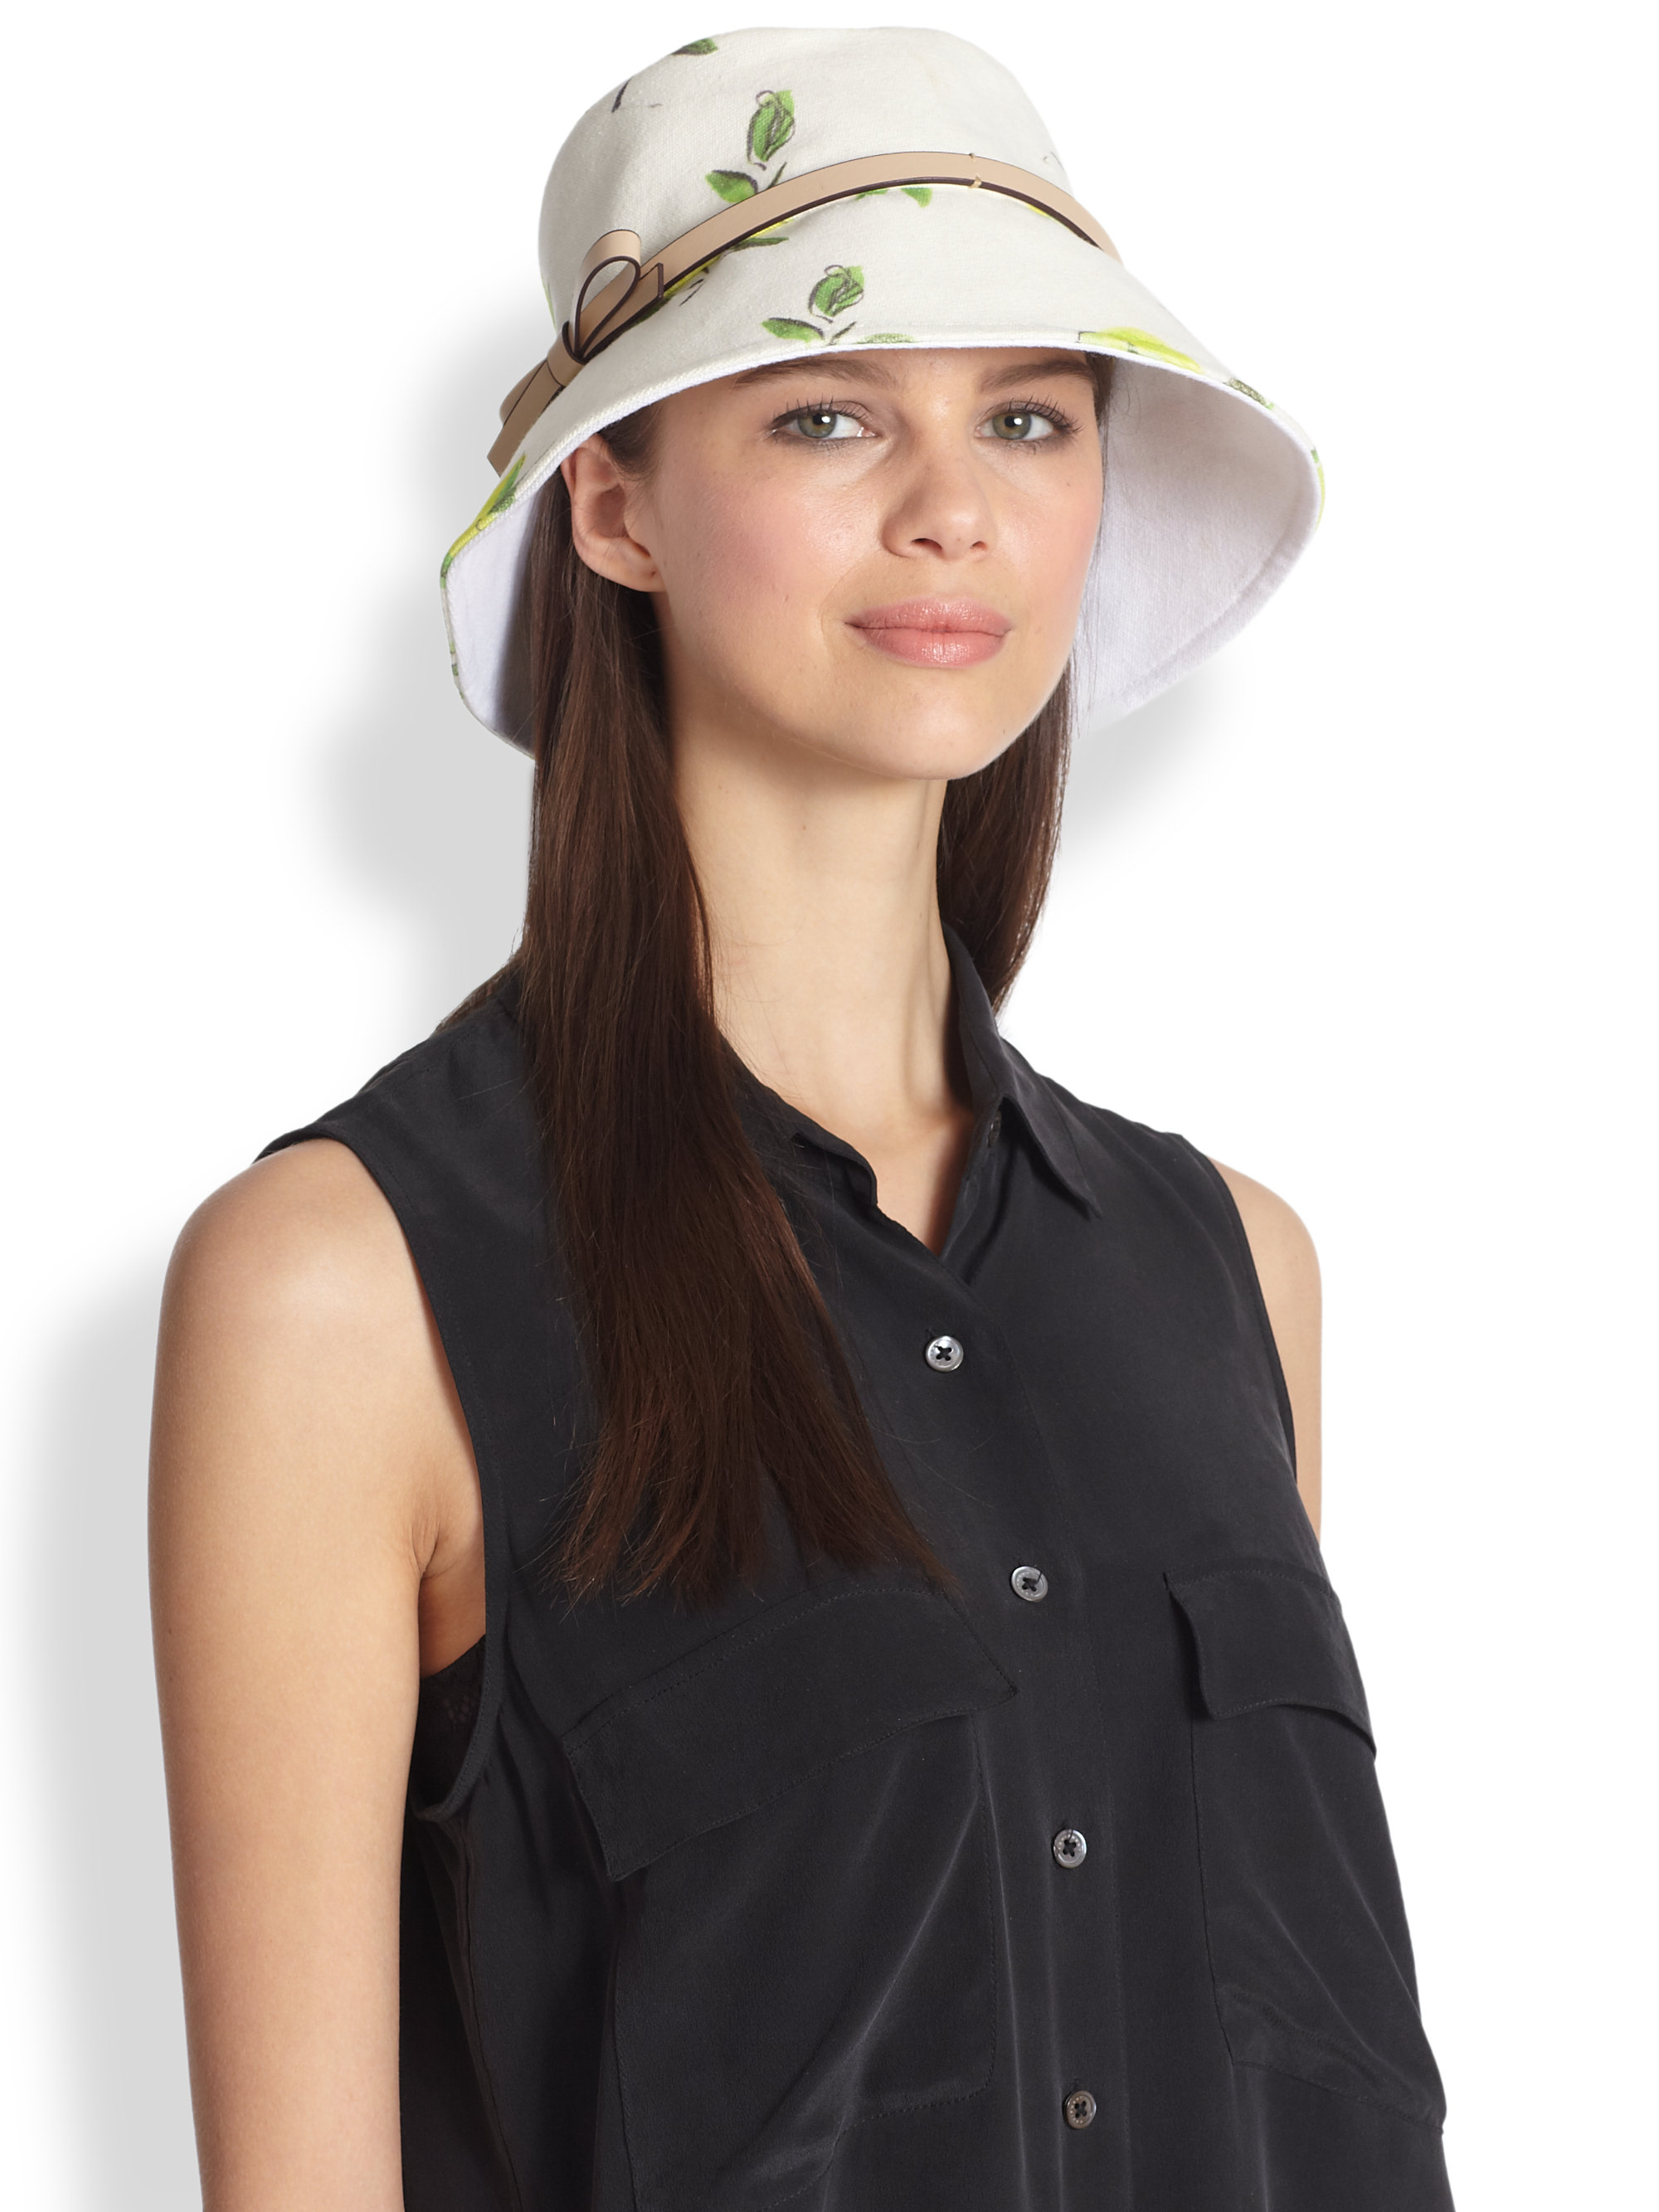 Lyst - Kate Spade Lemon Bonded Canvas Bucket Hat in White 821f9d085bd